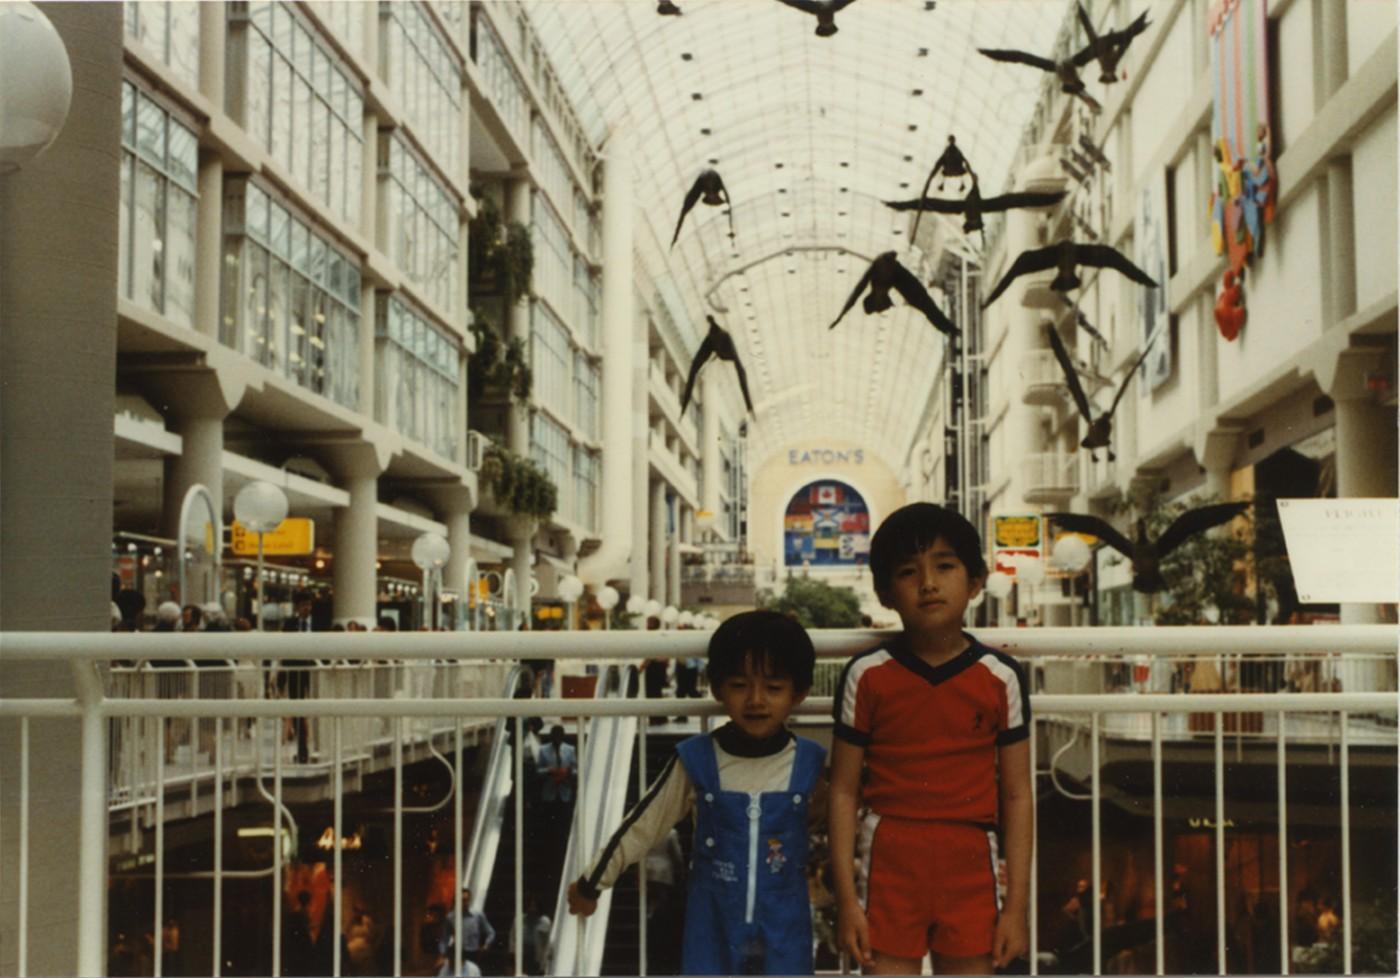 Luong Thai Lu, </span><span><em>Binh and Hon at the Eaton's Centre, Toronto, ON</em>, </span><span>June 1980. Dye coupler print. Courtesy of the Lu-Thai family.